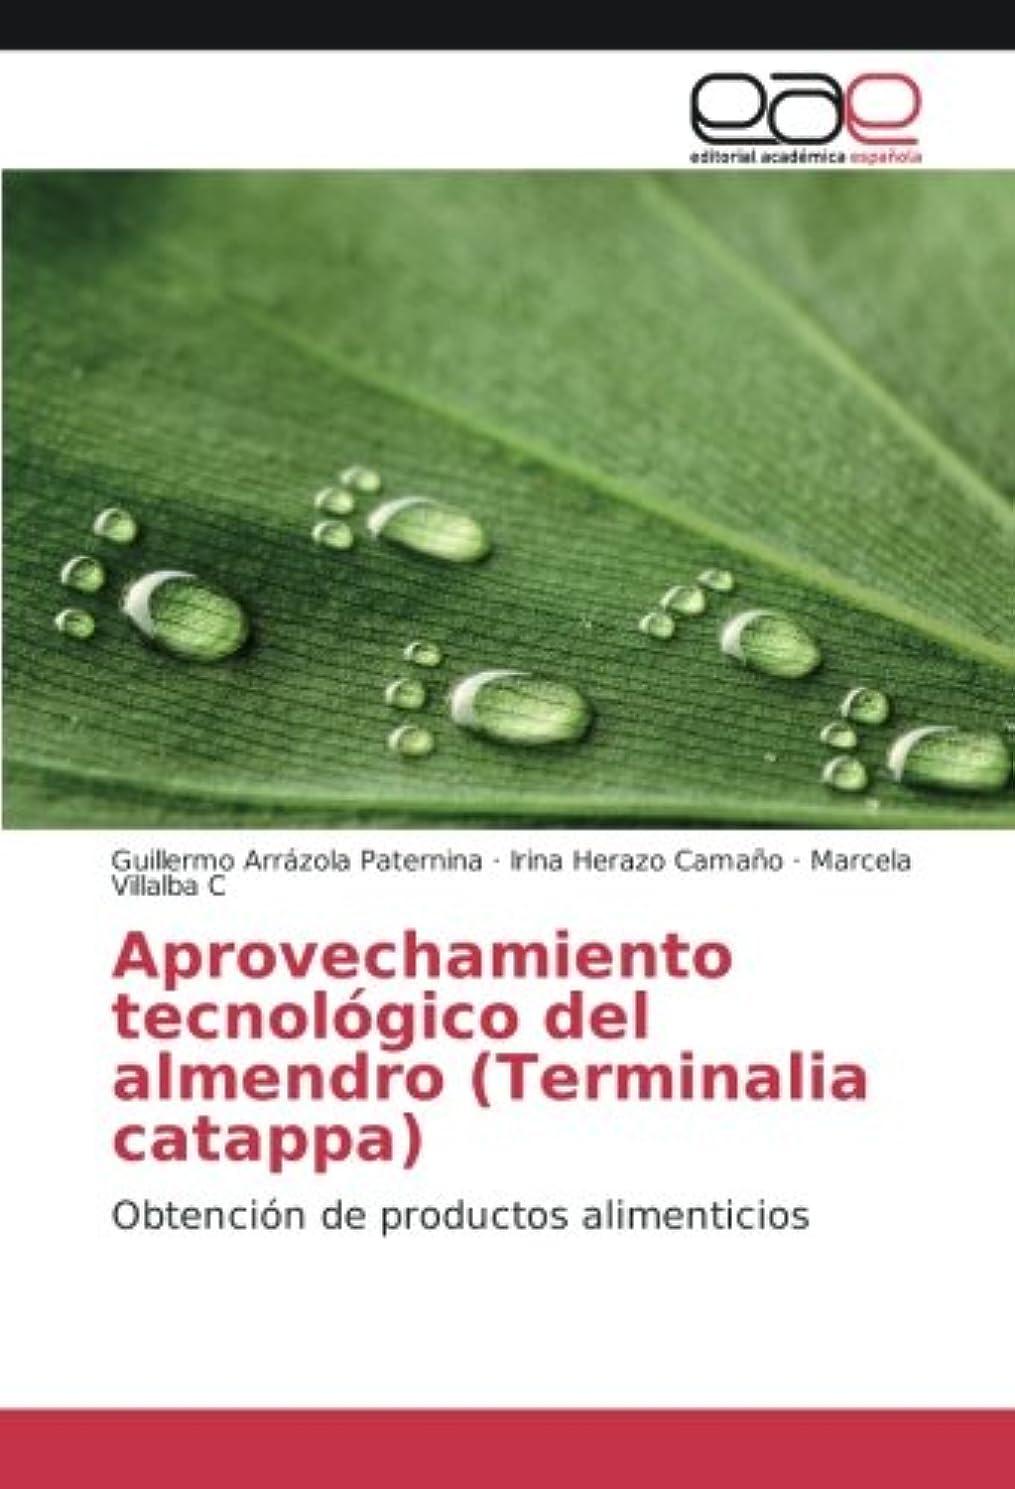 楕円形美容師宿命Aprovechamiento tecnológico del almendro (Terminalia catappa): Obtención de productos alimenticios